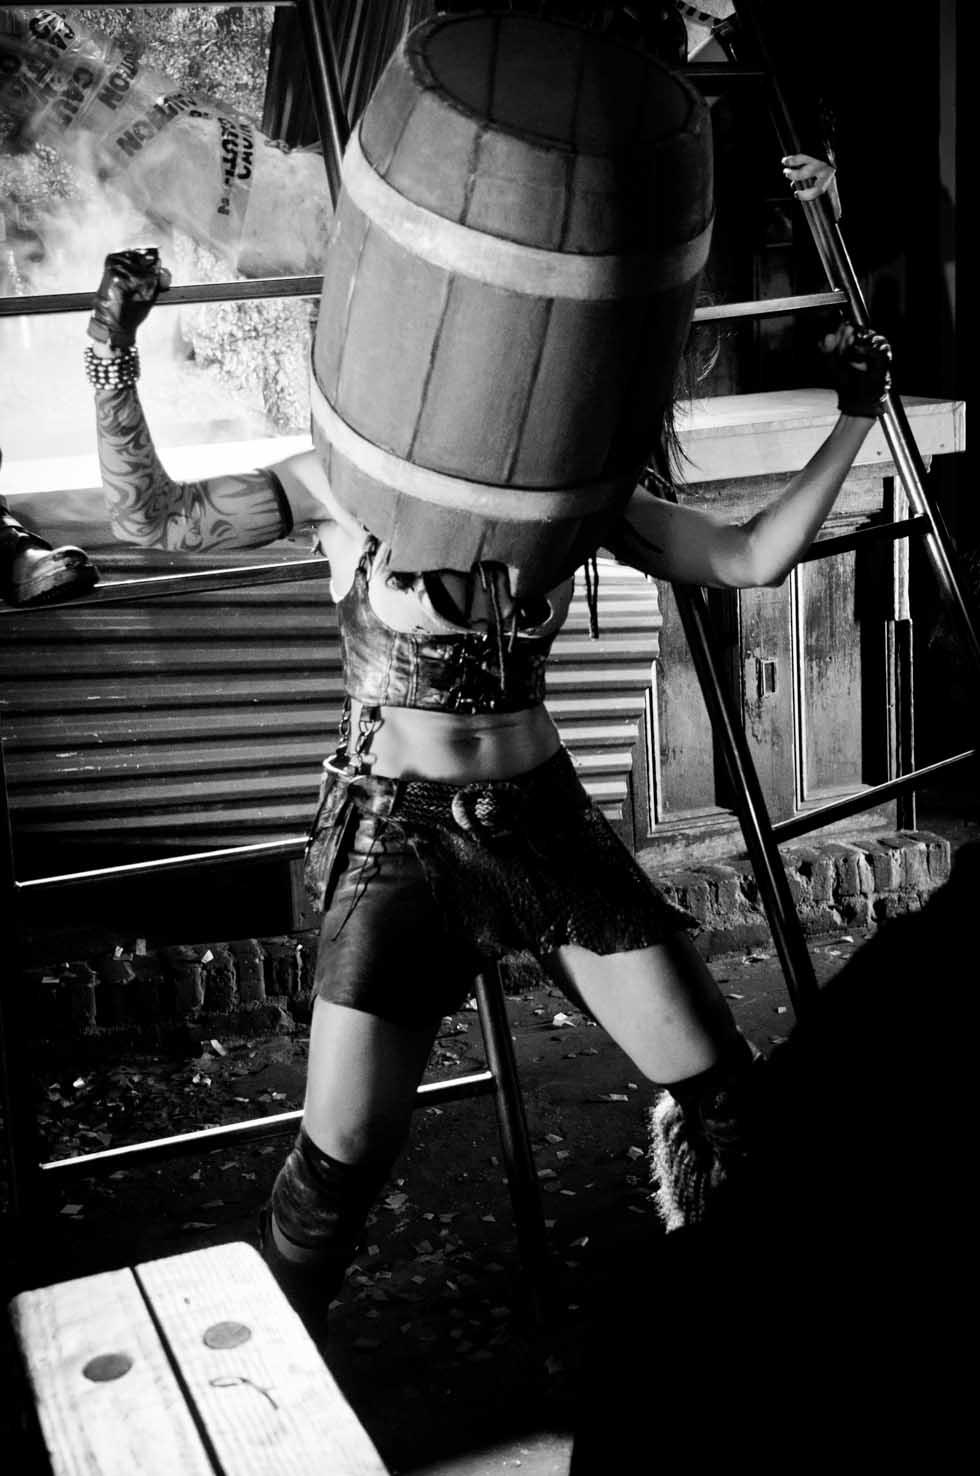 zum-schneider-nyc-2012-karneval-apocalyptika-3582.jpg